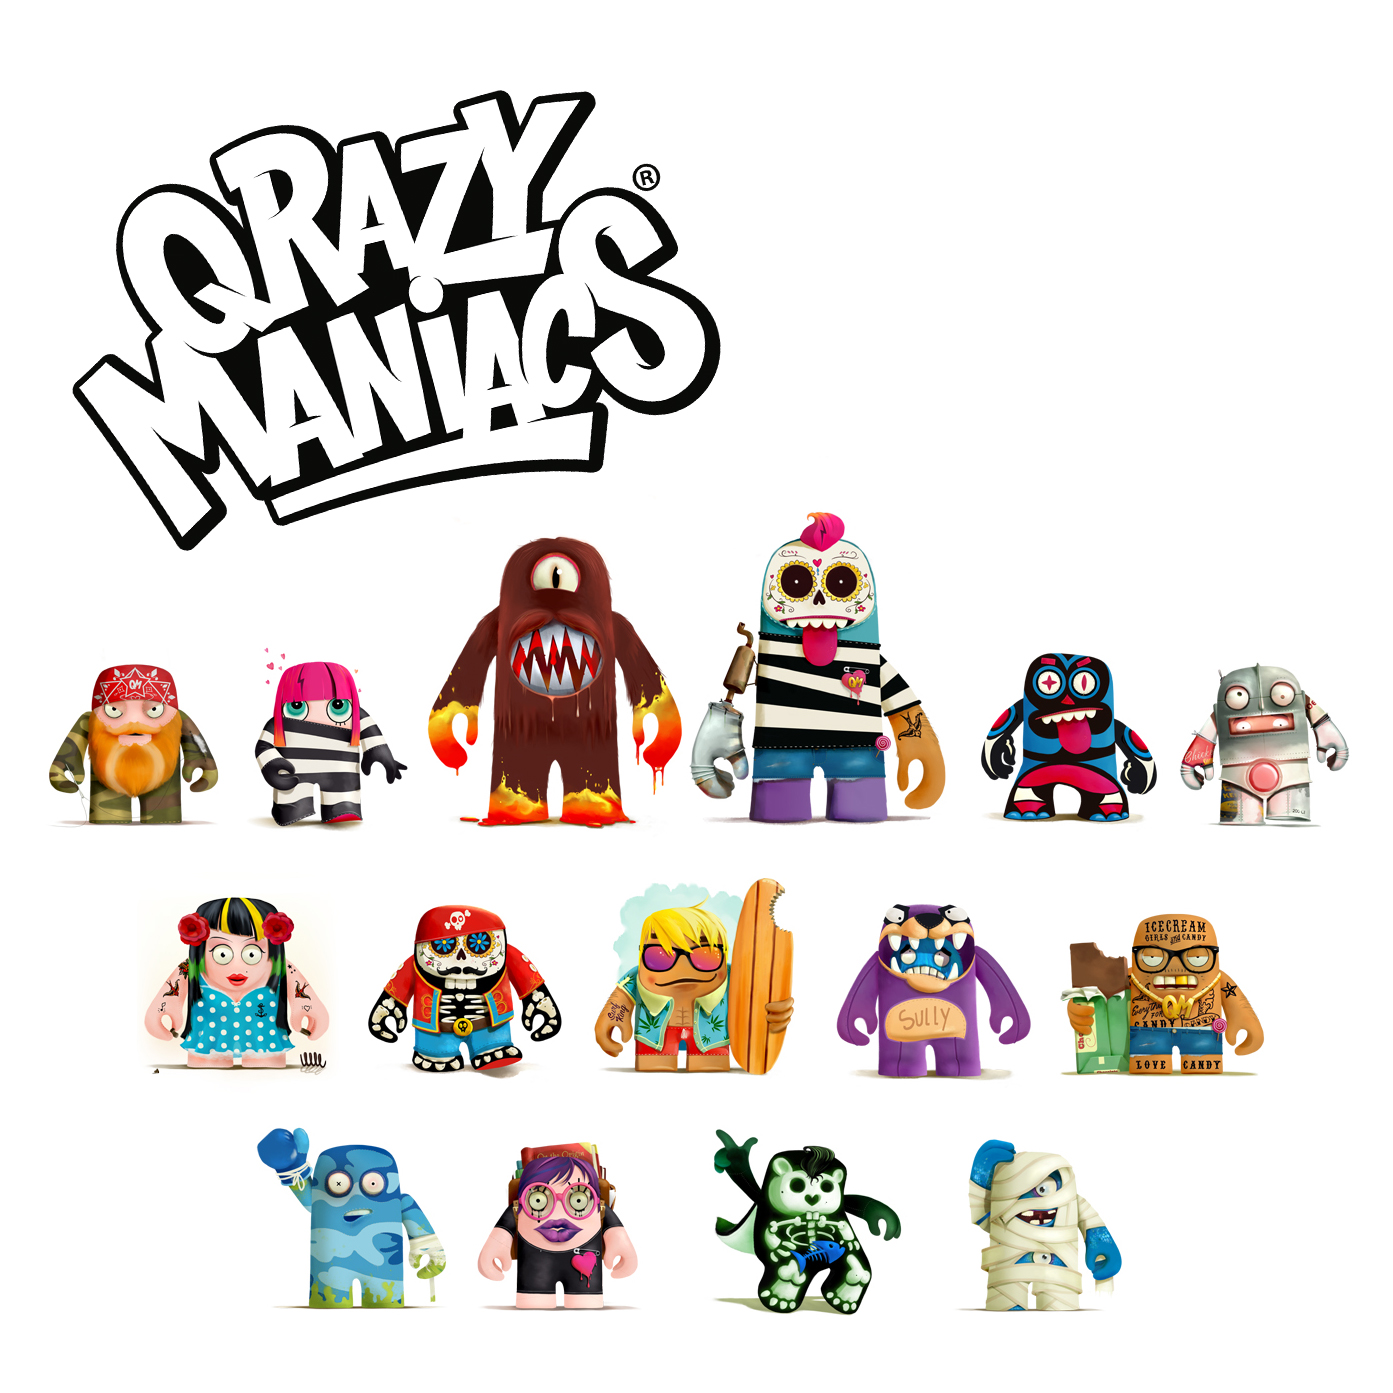 Design character figurines  Studio Monnikenwerk ©